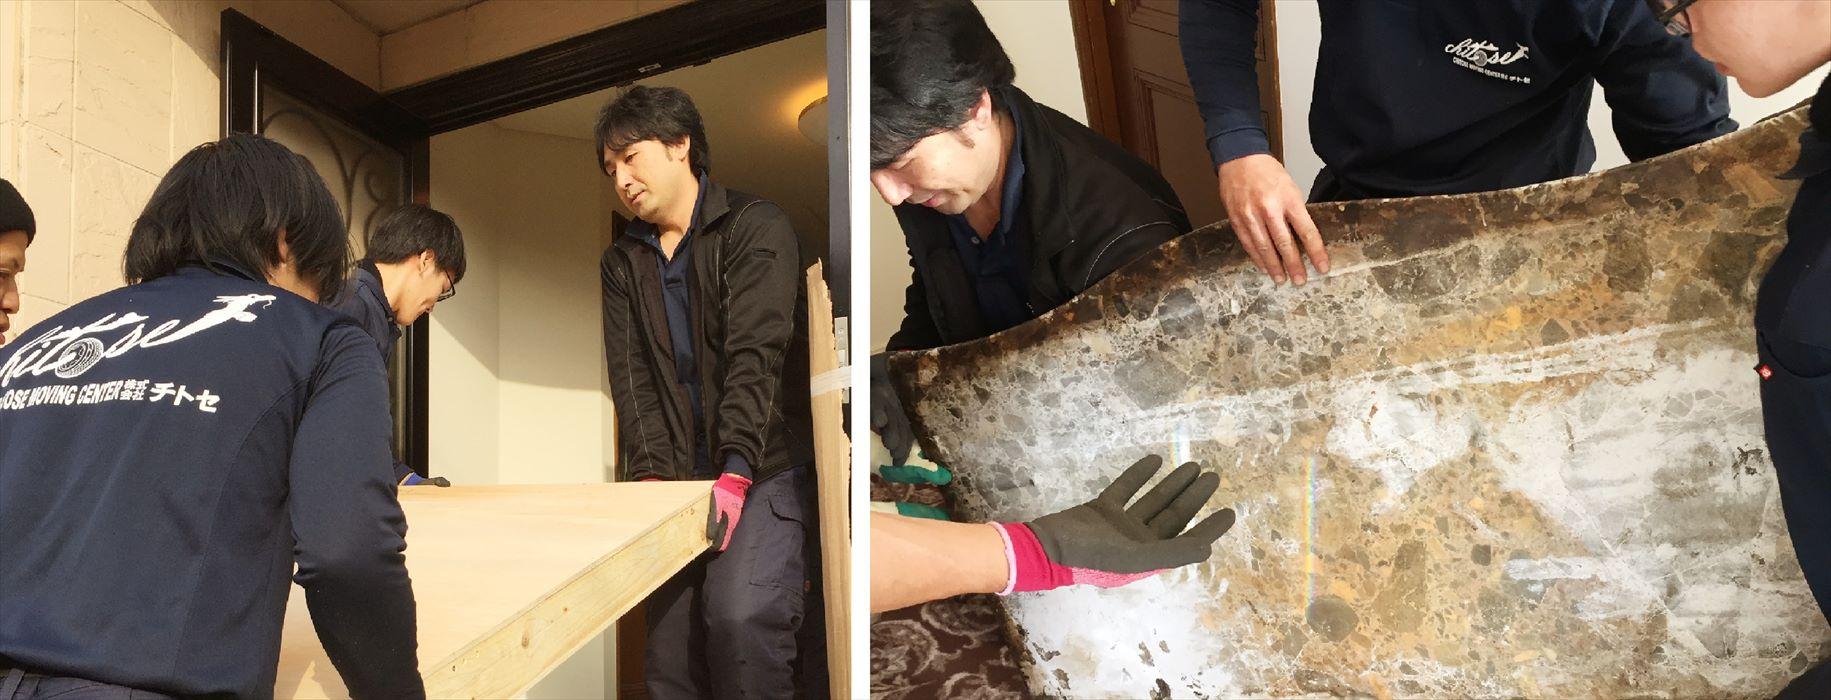 大理石天板の搬入作業